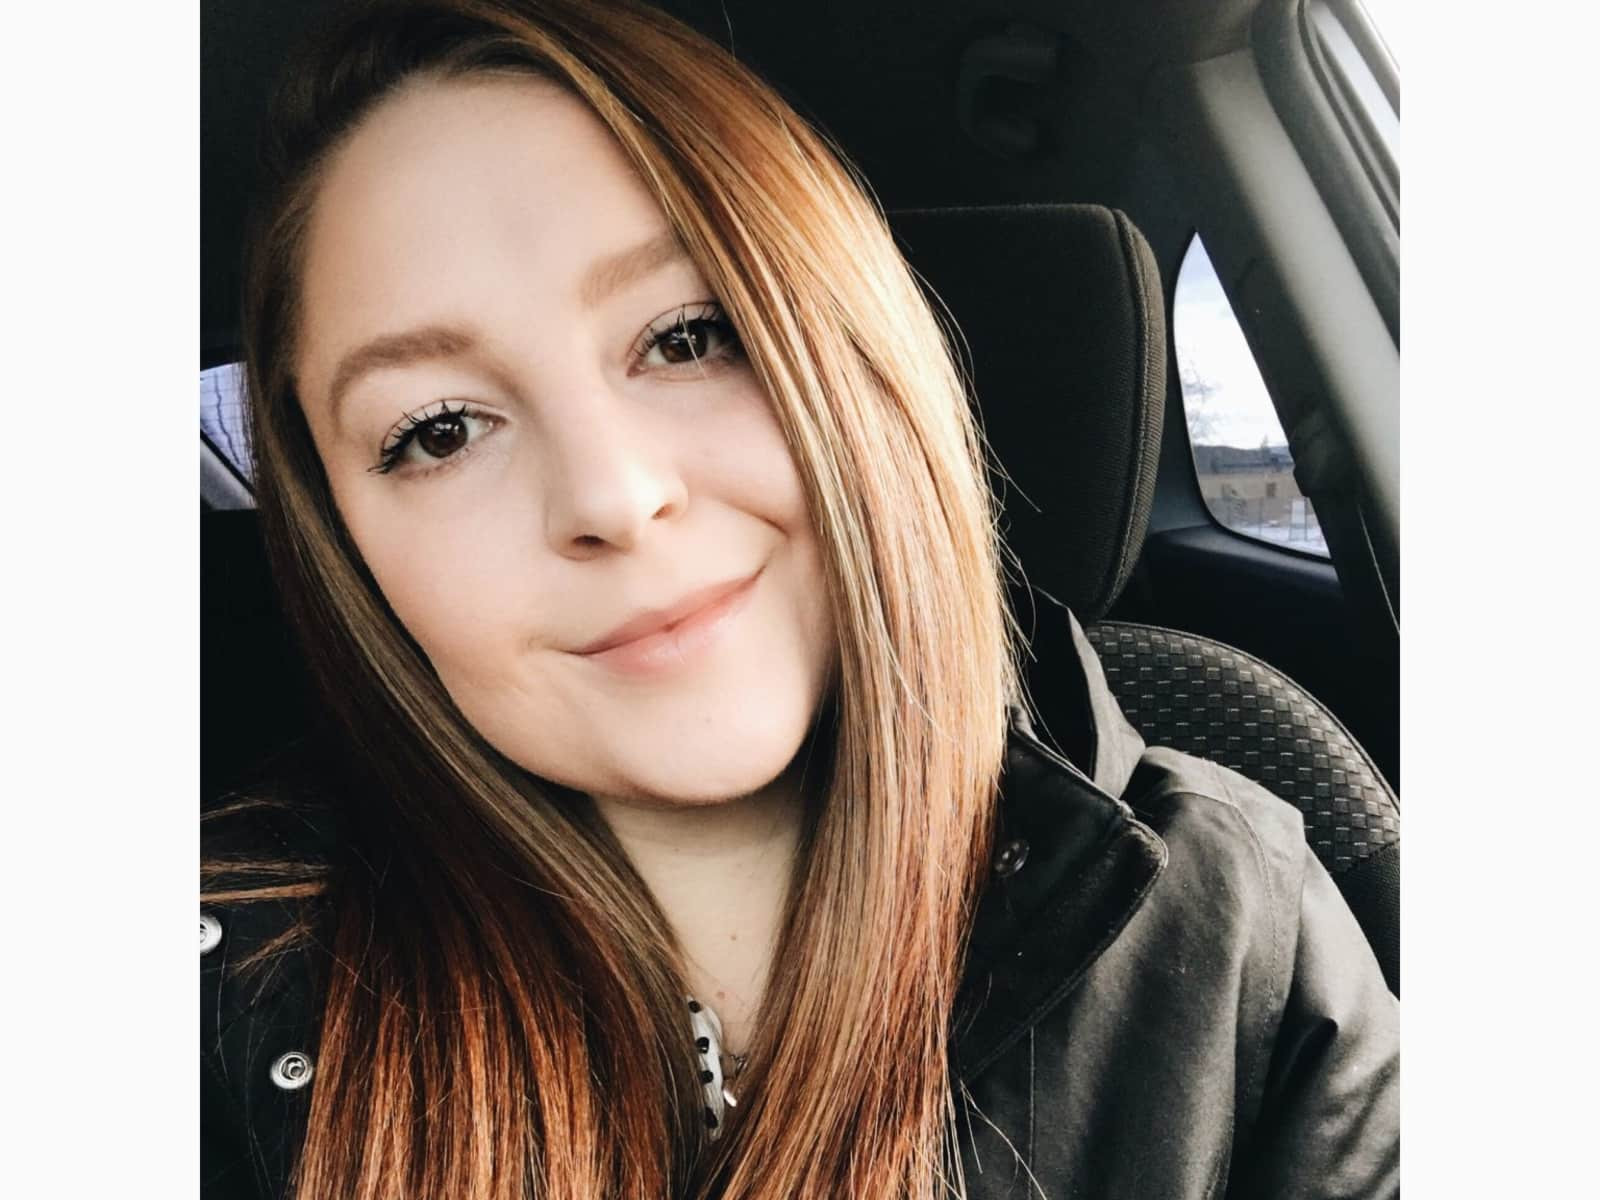 Kyra from Kelowna, British Columbia, Canada